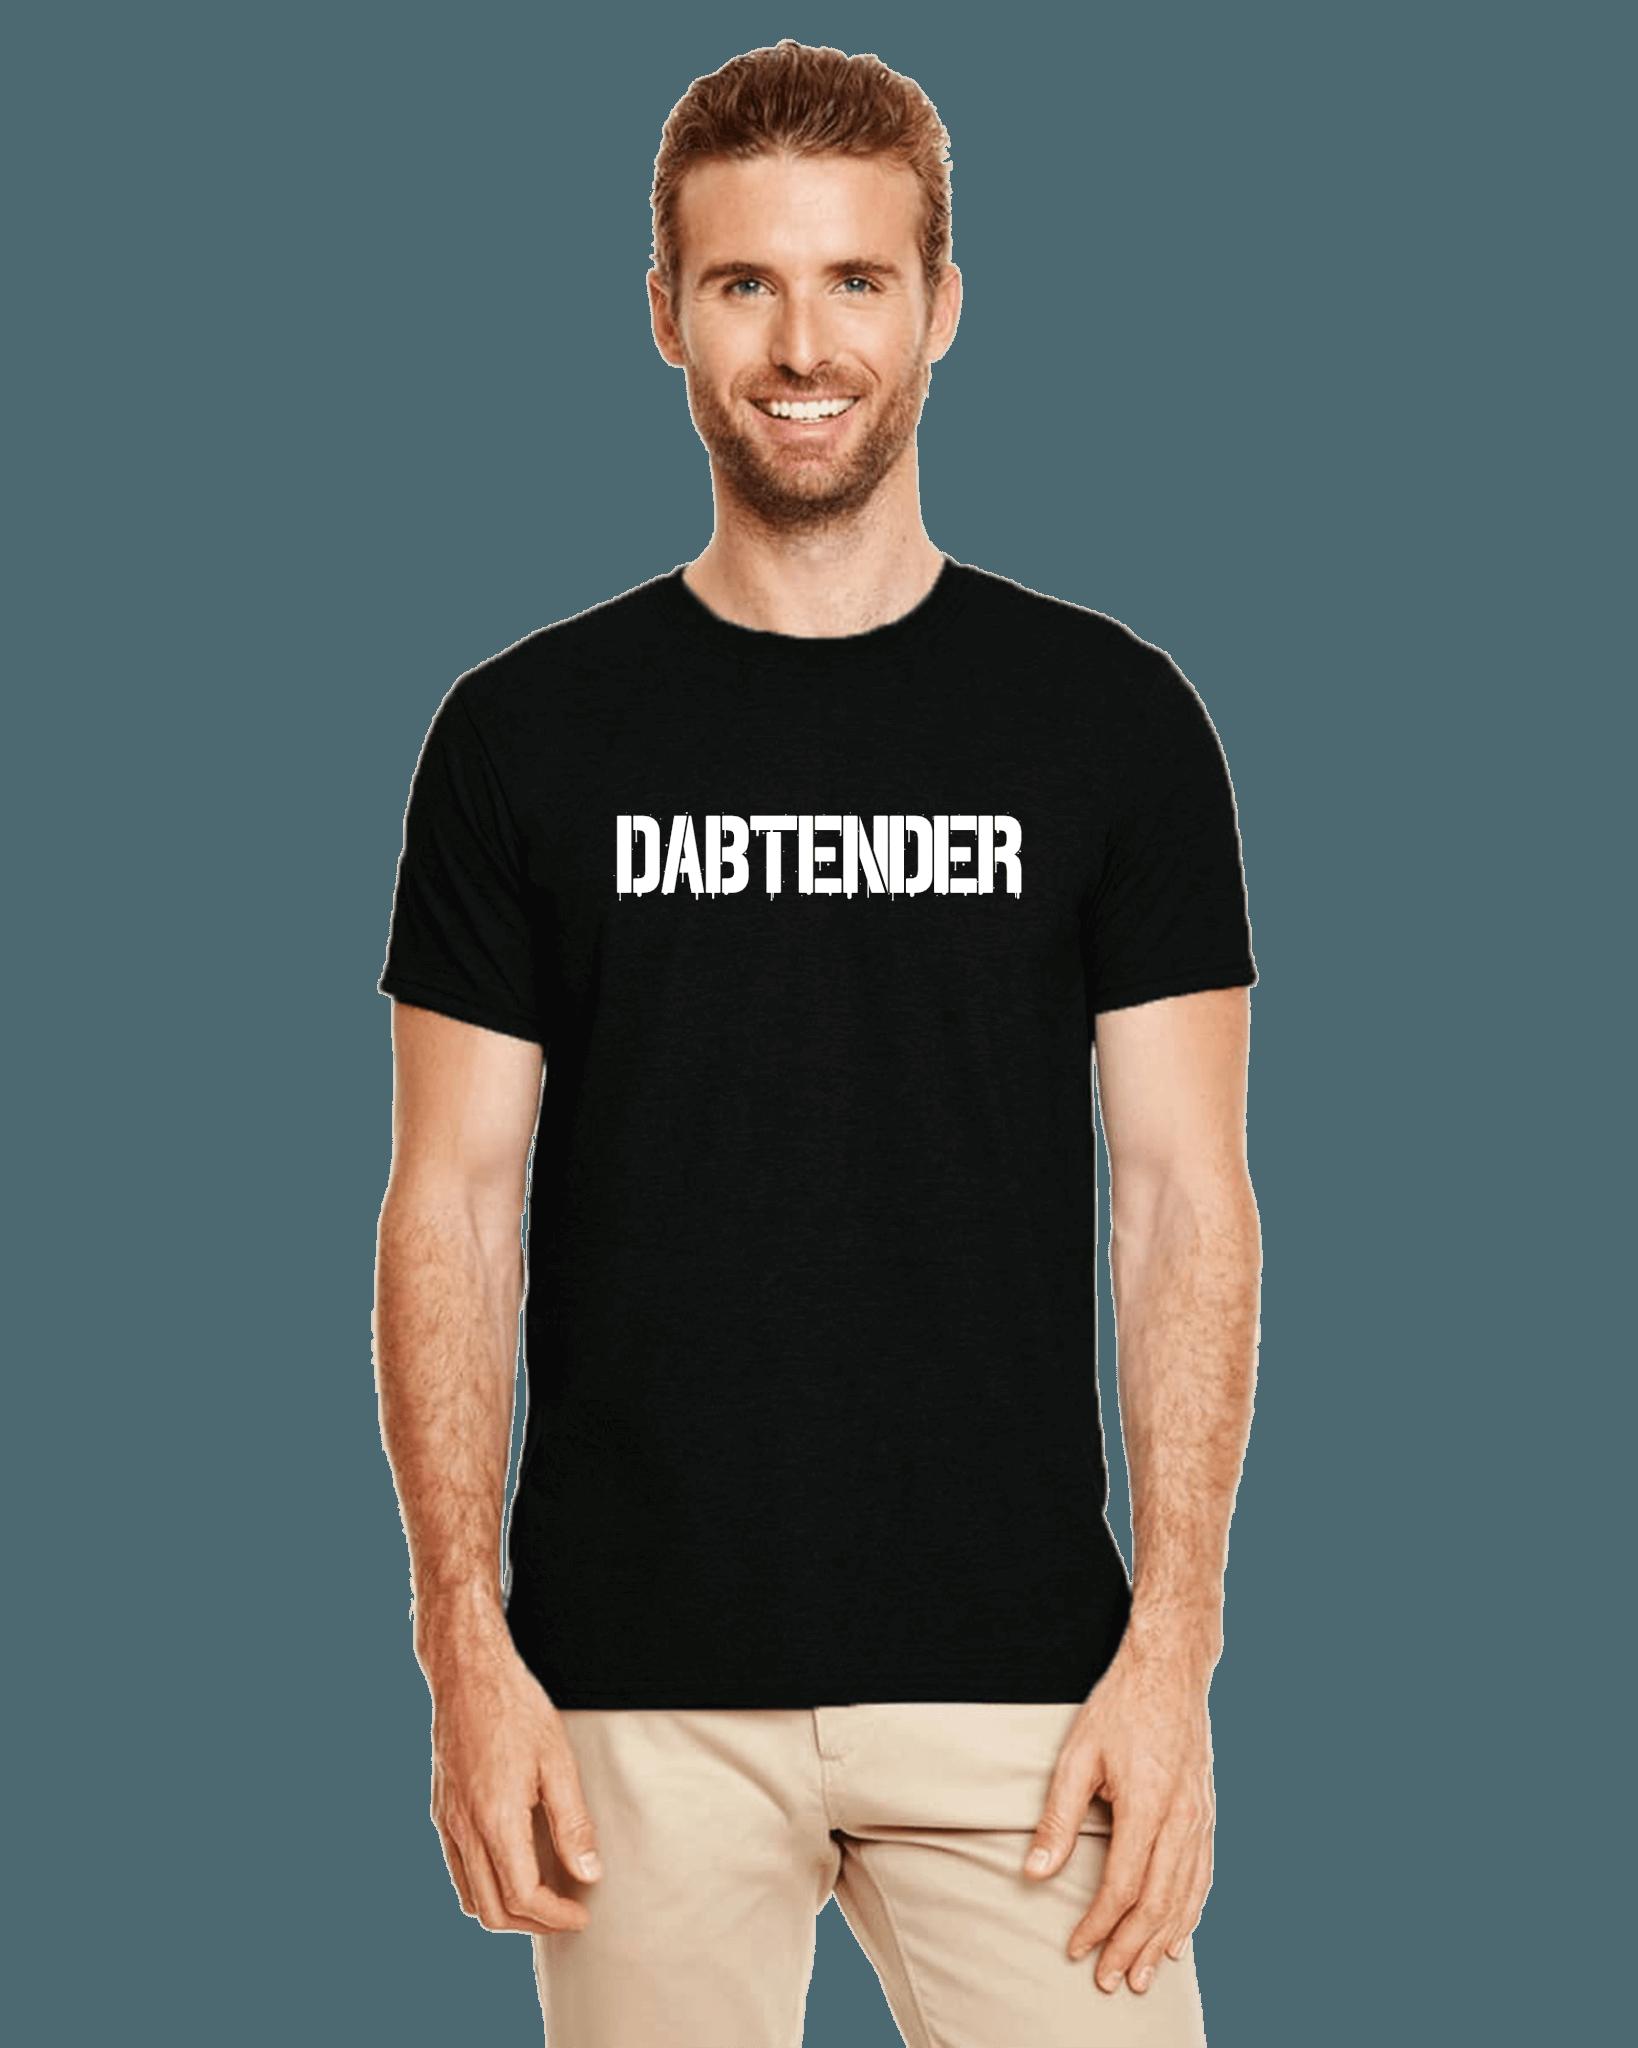 Dabtender 420 t-shirt